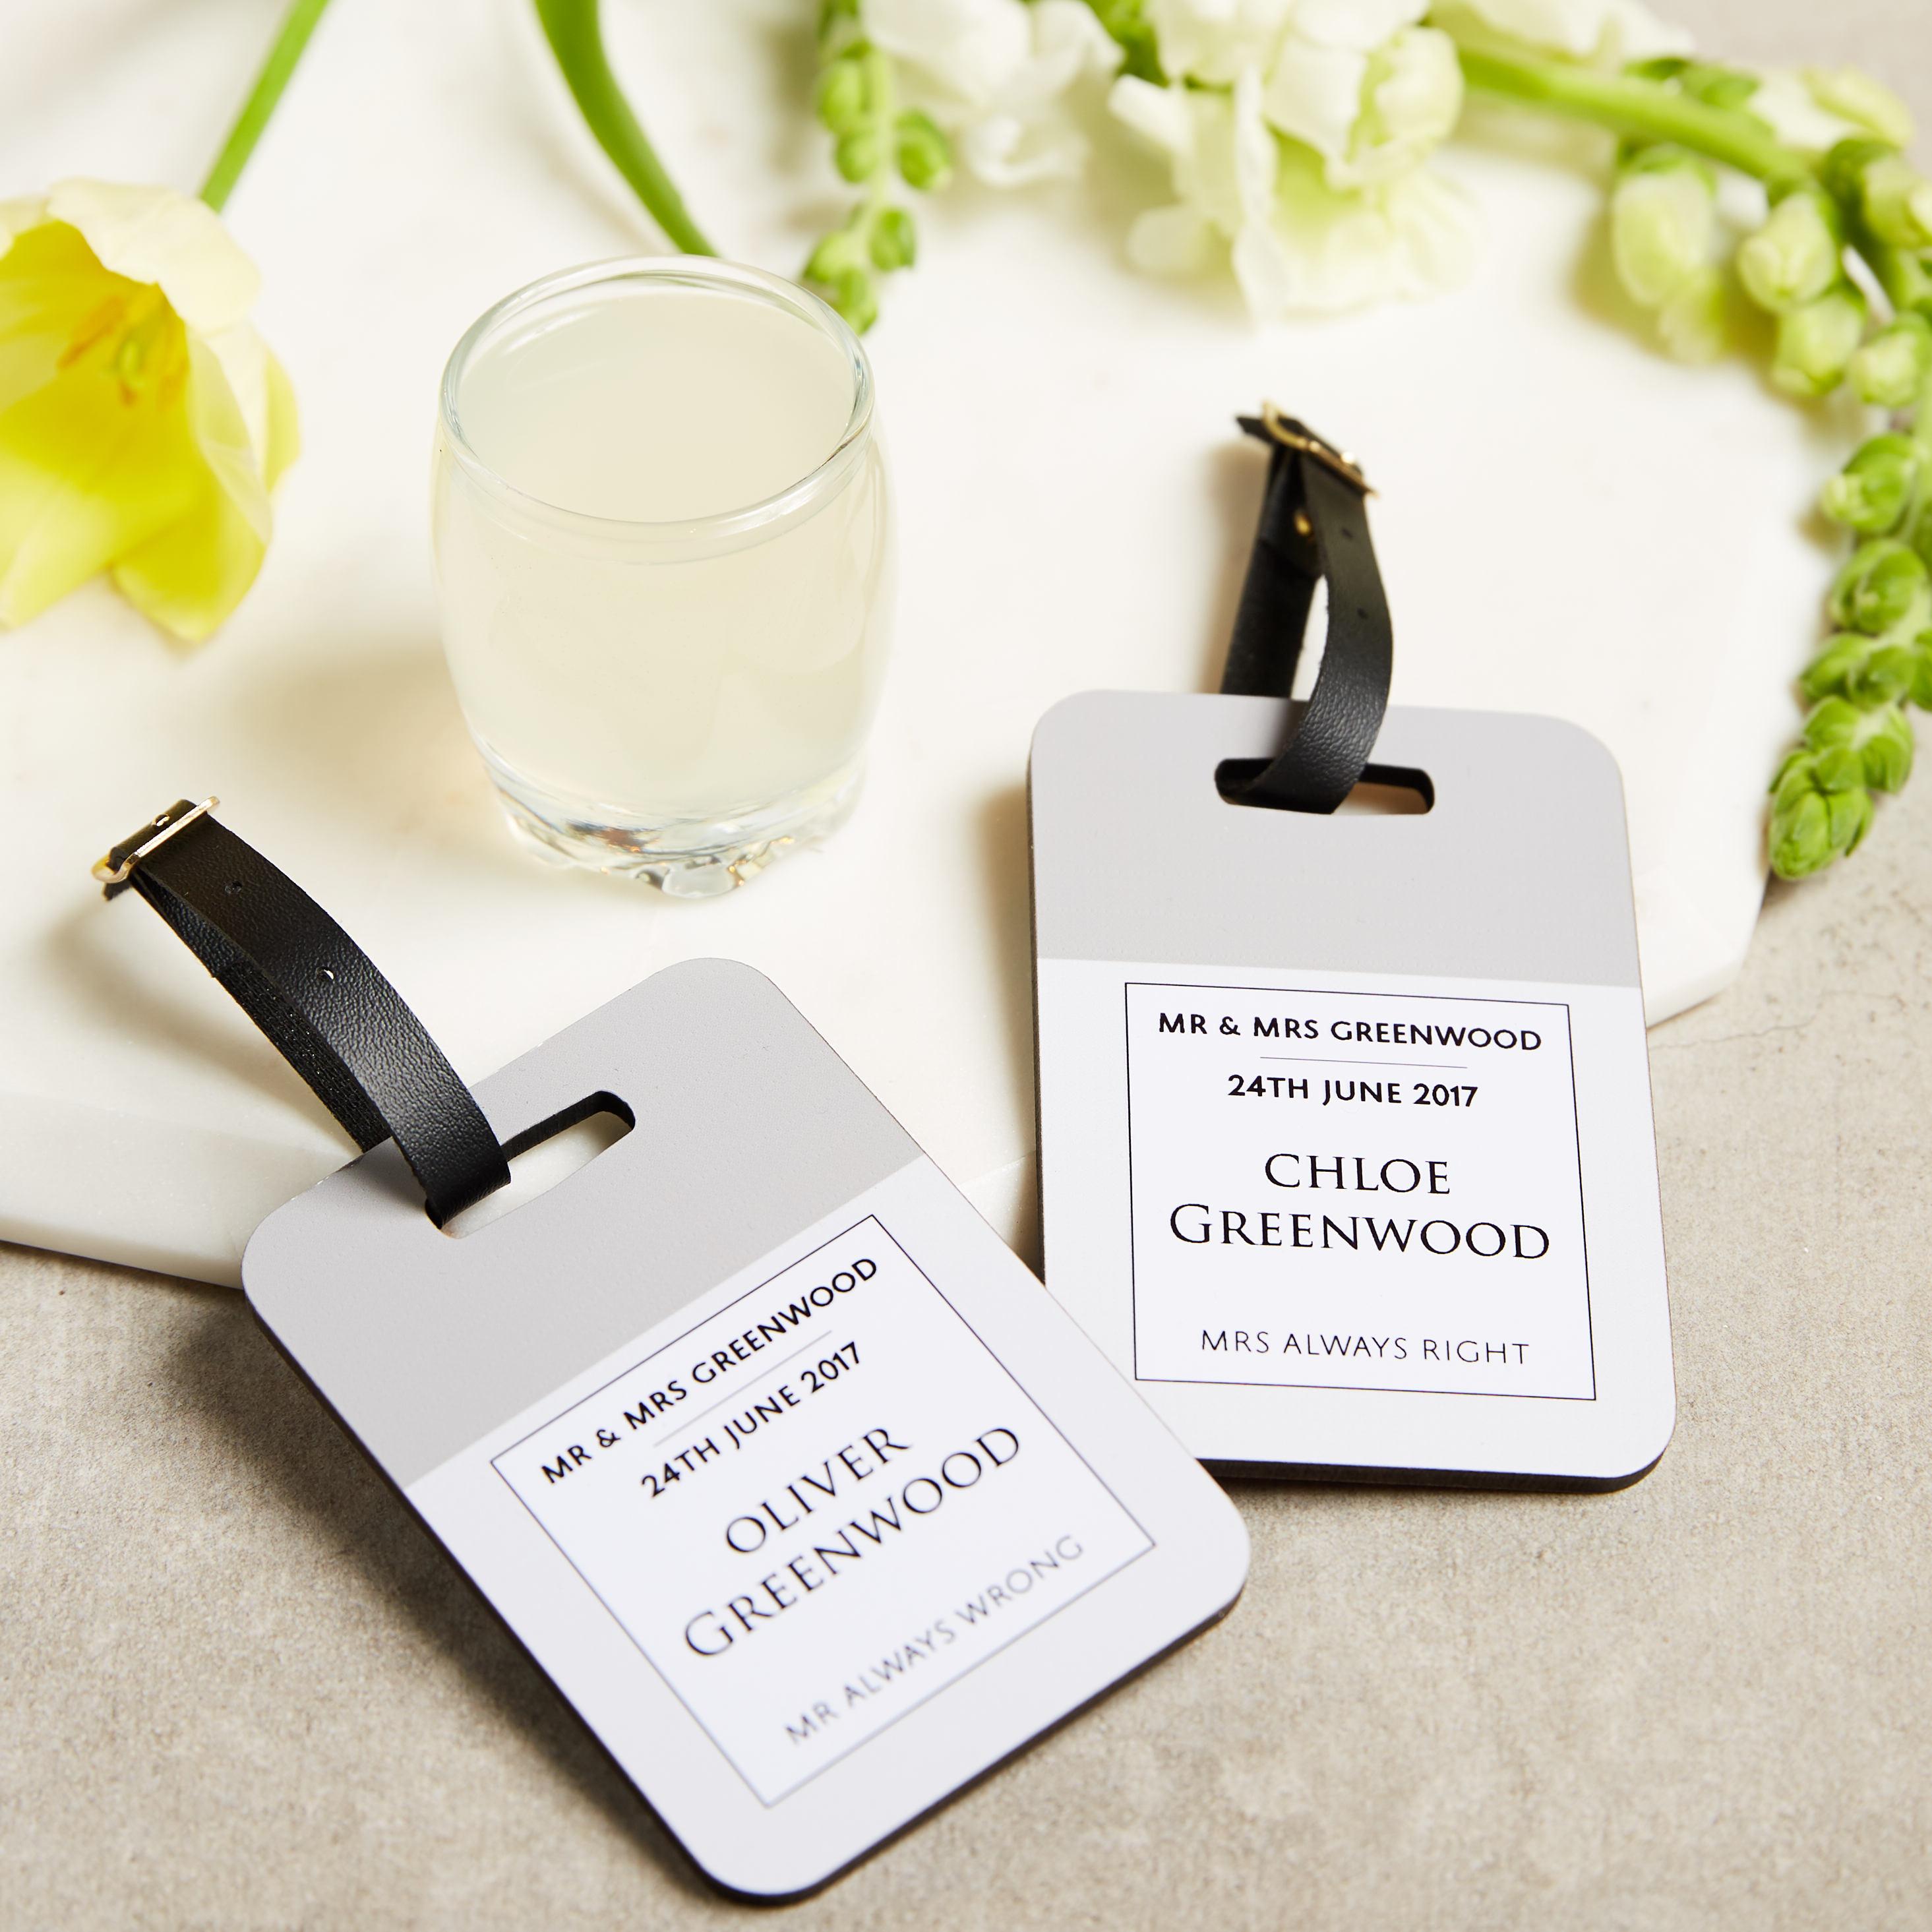 Wedding luggage tag  Luggage tag  Identification tag  Honeymoon gift  Wedding gift  Personalised wedding gift  Bag tag  Mr  Mrs gift